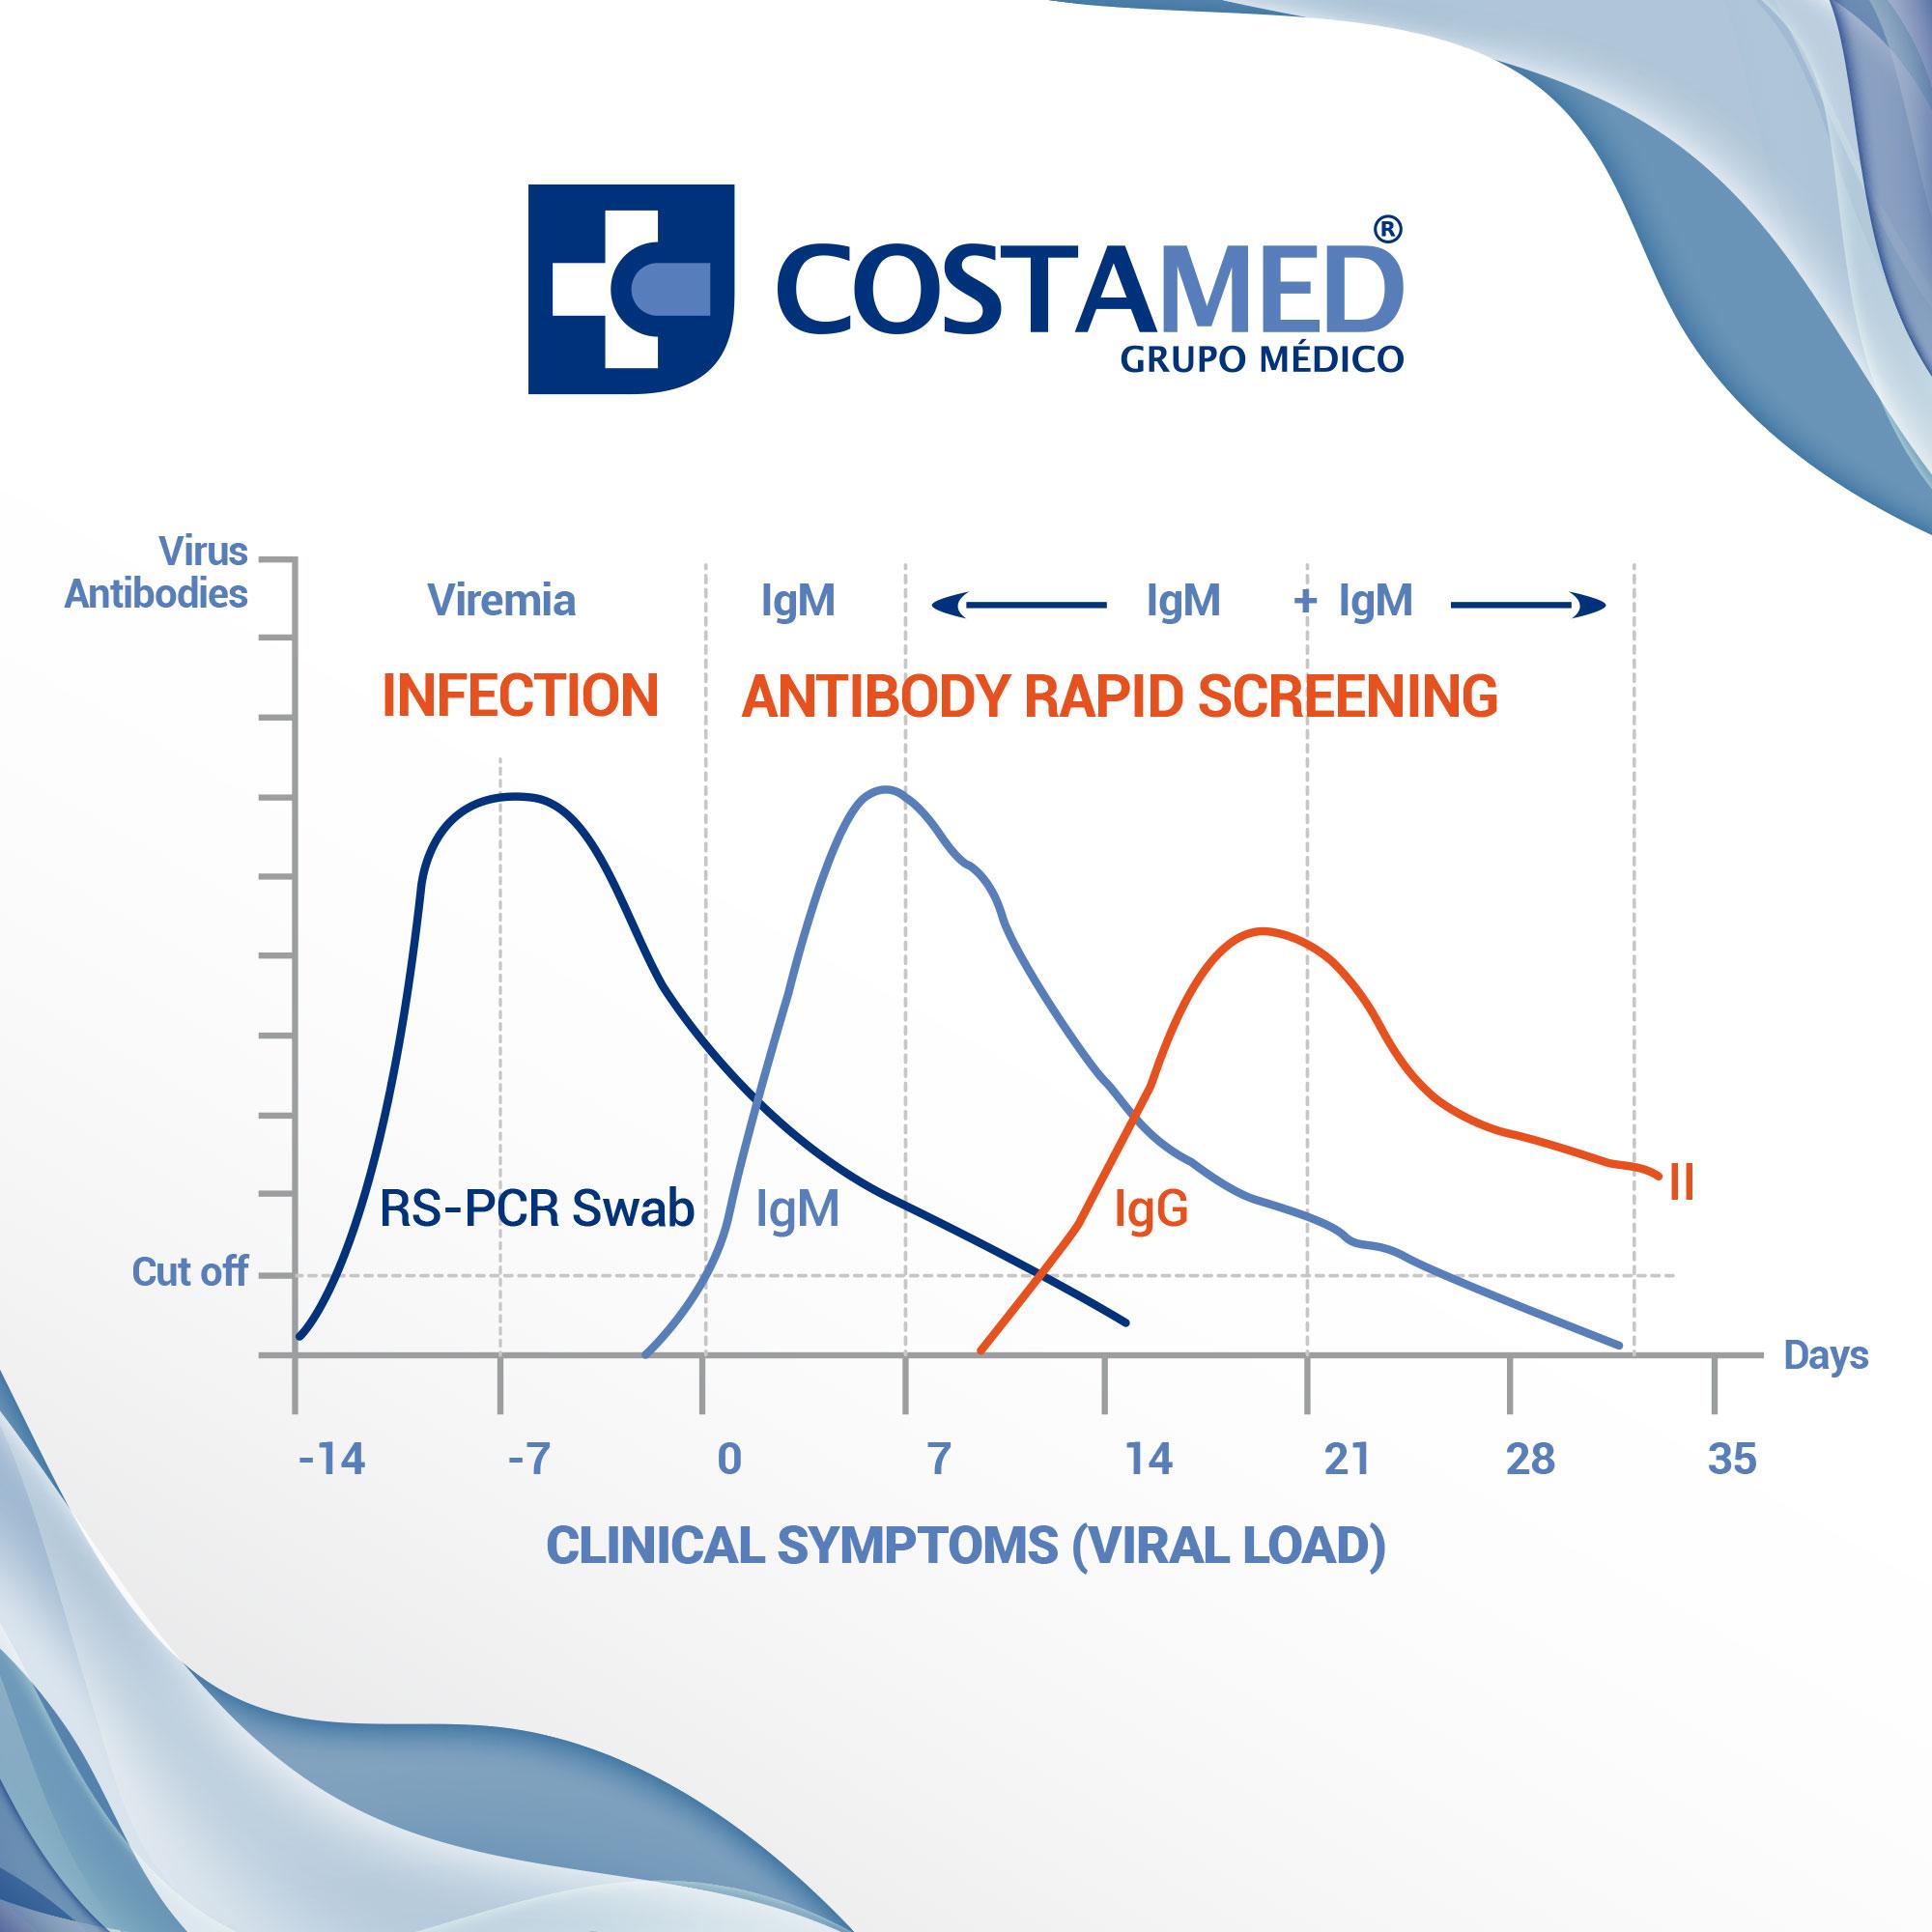 Clinical-Symptoms.jpg